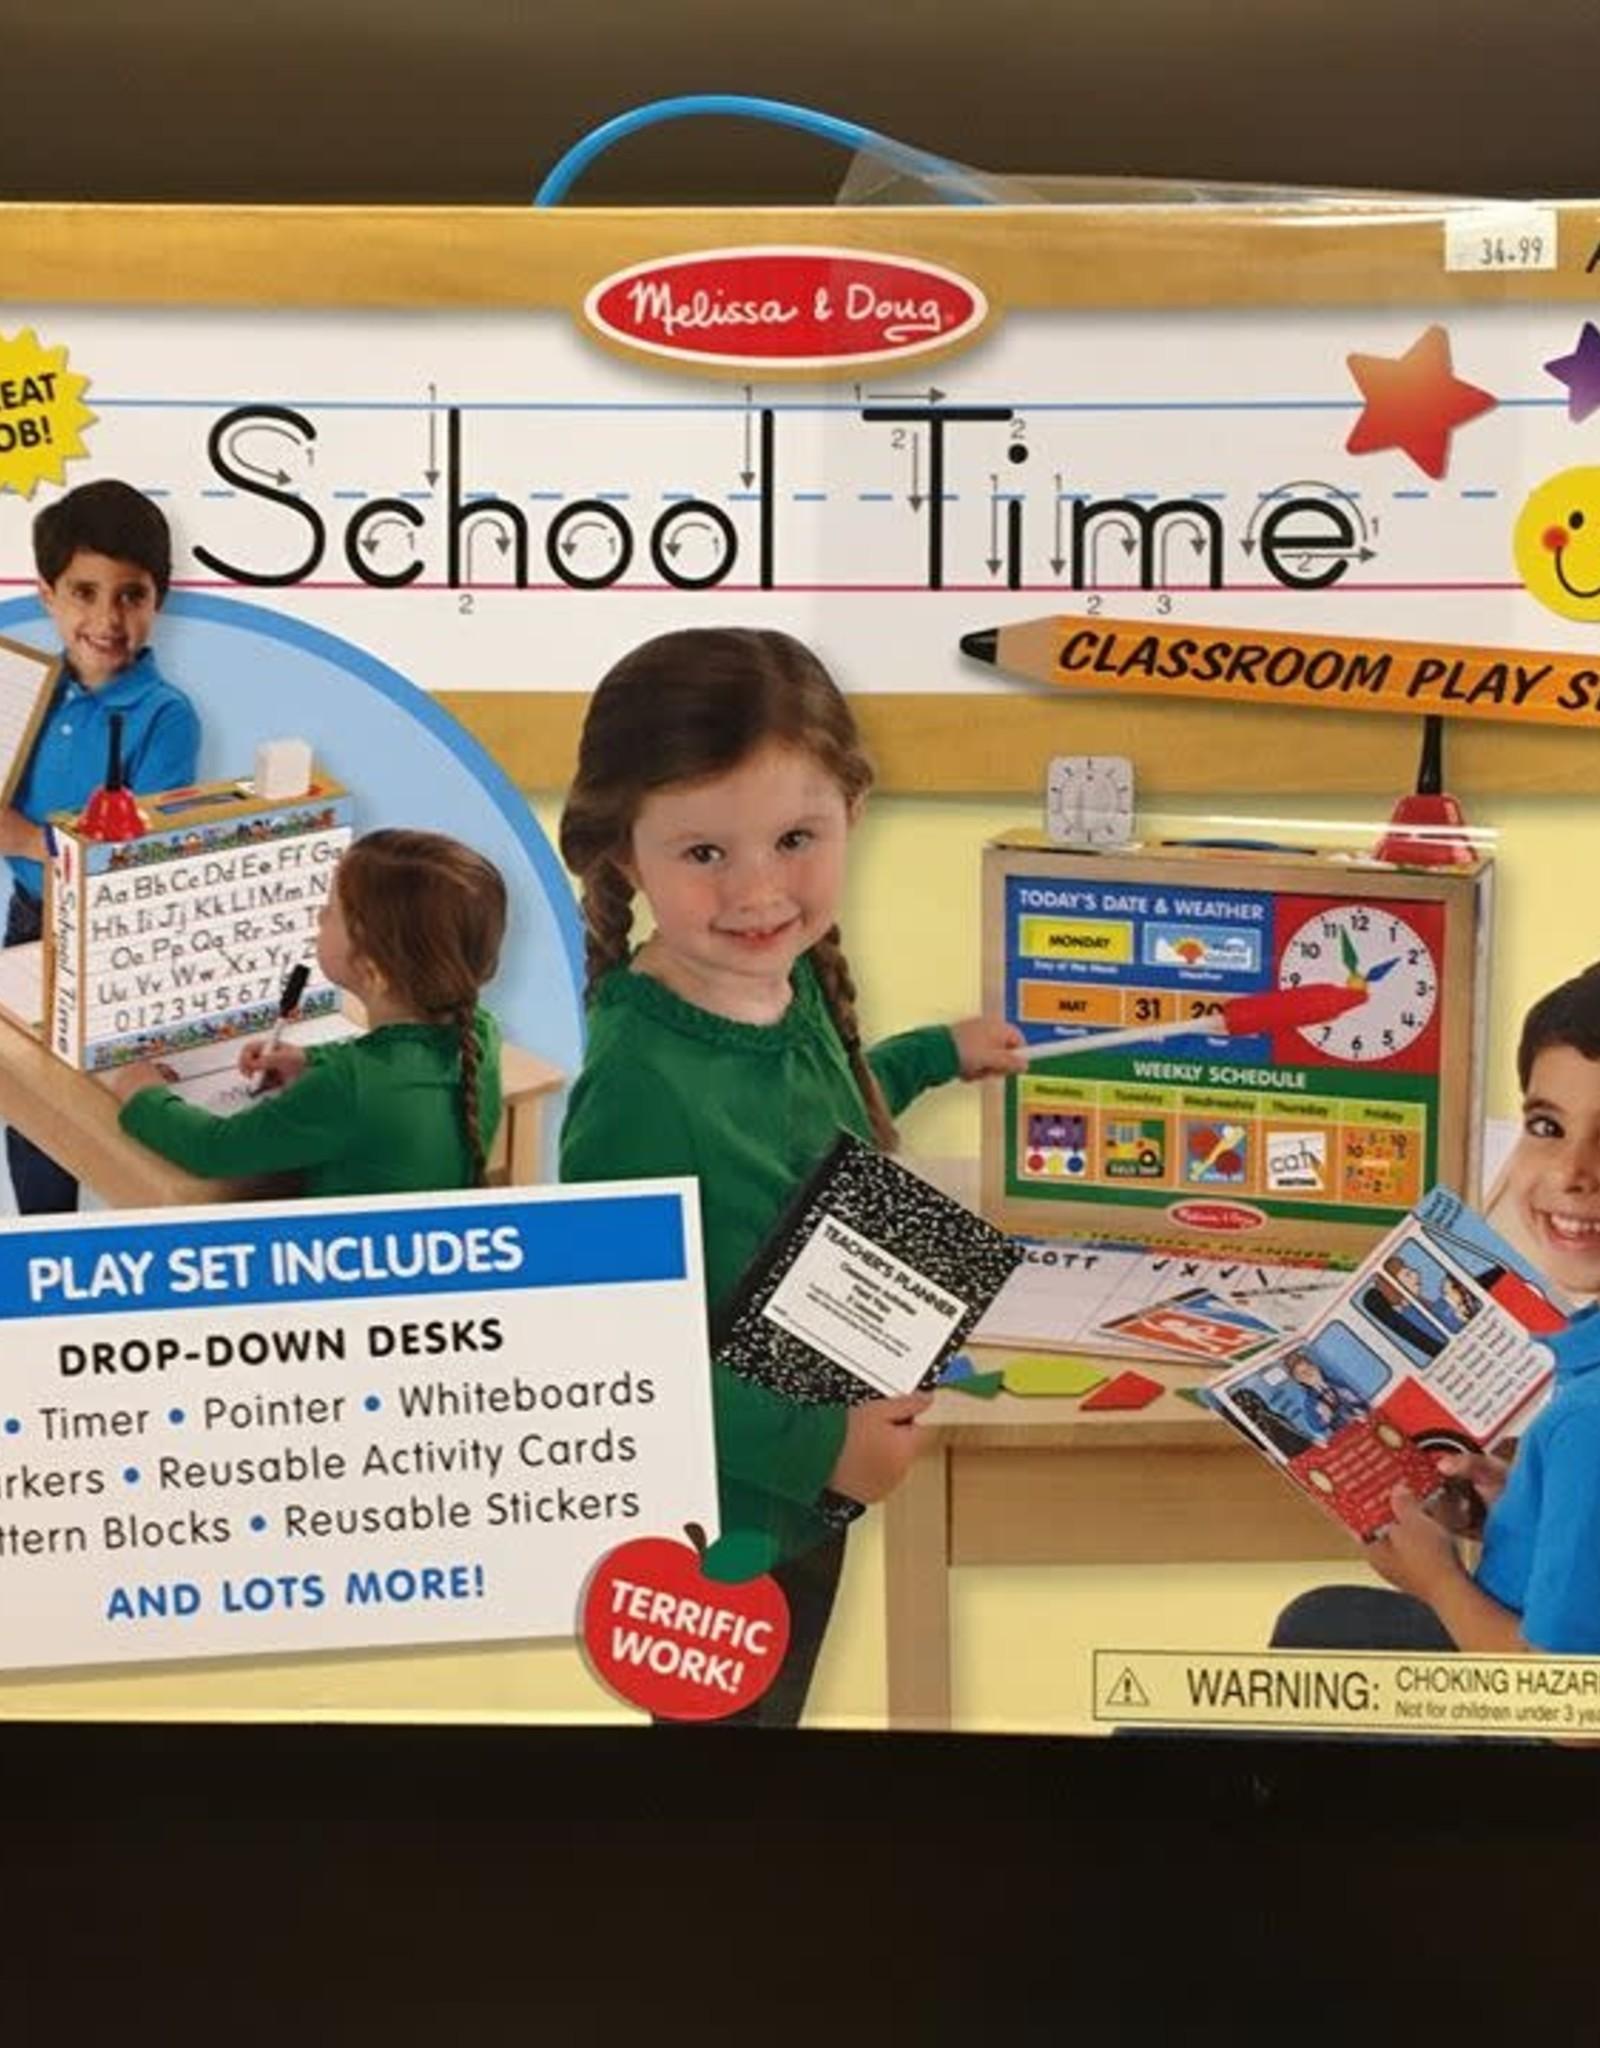 MELISSA & DOUG SCHOOL TIME PLAY SET